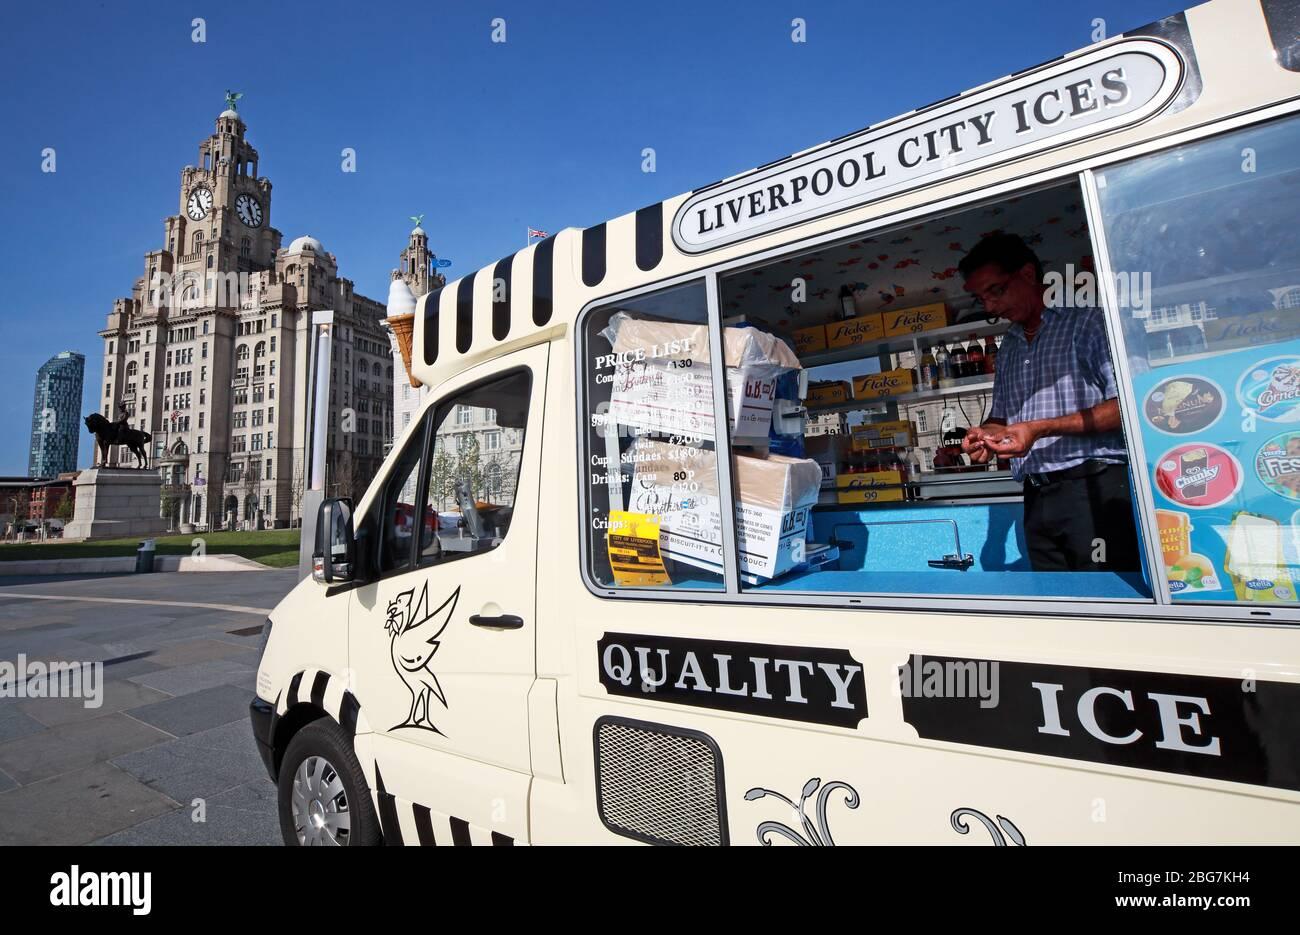 Dieses Stockfoto: Liverpool City ICES, Eisdiele, am Pier Head Ufer, mit Royal Liver Building, Stadtzentrum, Liverpool, Merseyside, England, UK, L3 1HU - 2BG7KH